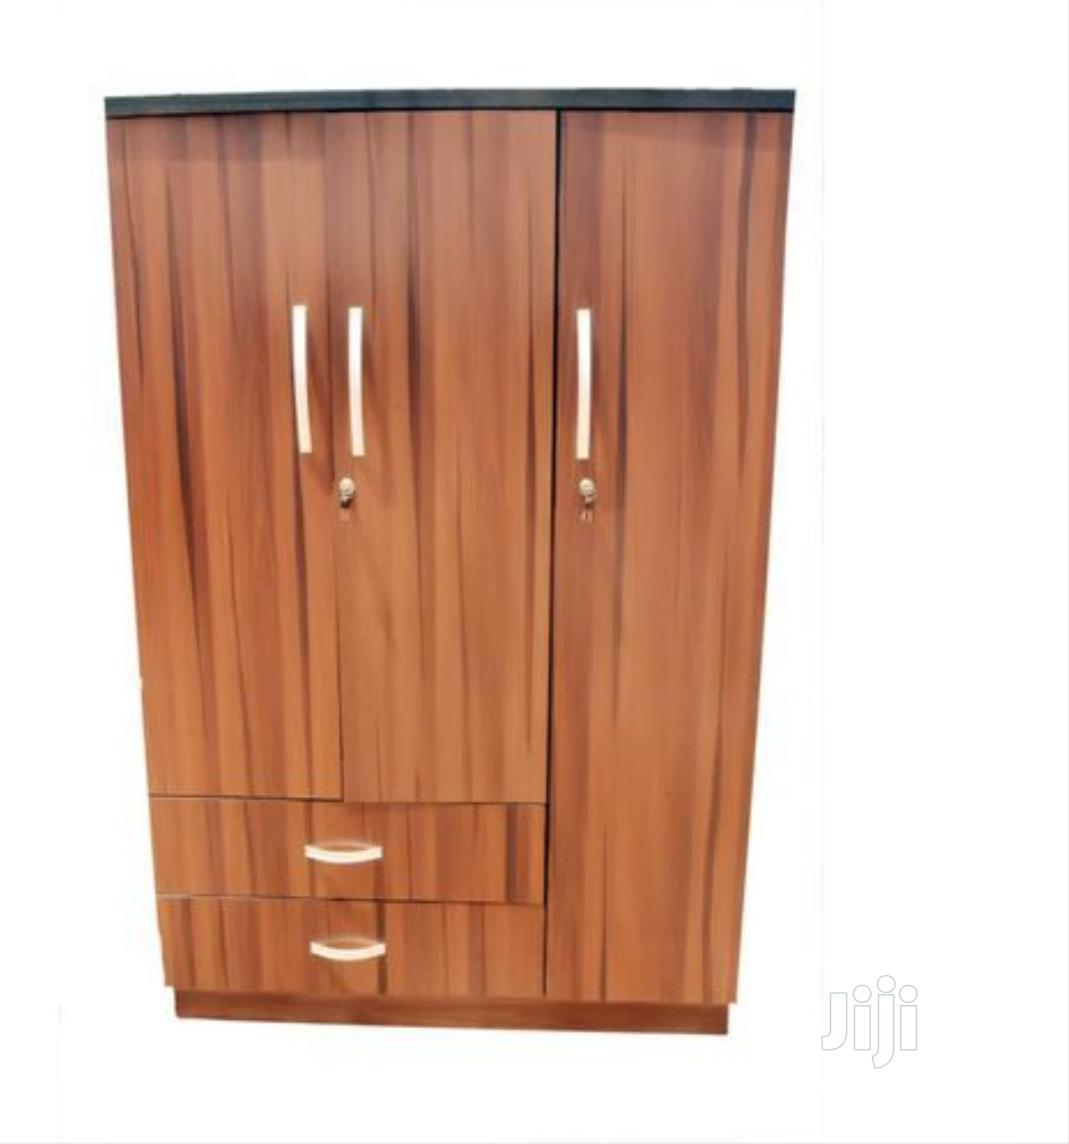 Standard Wooden Wardrobe